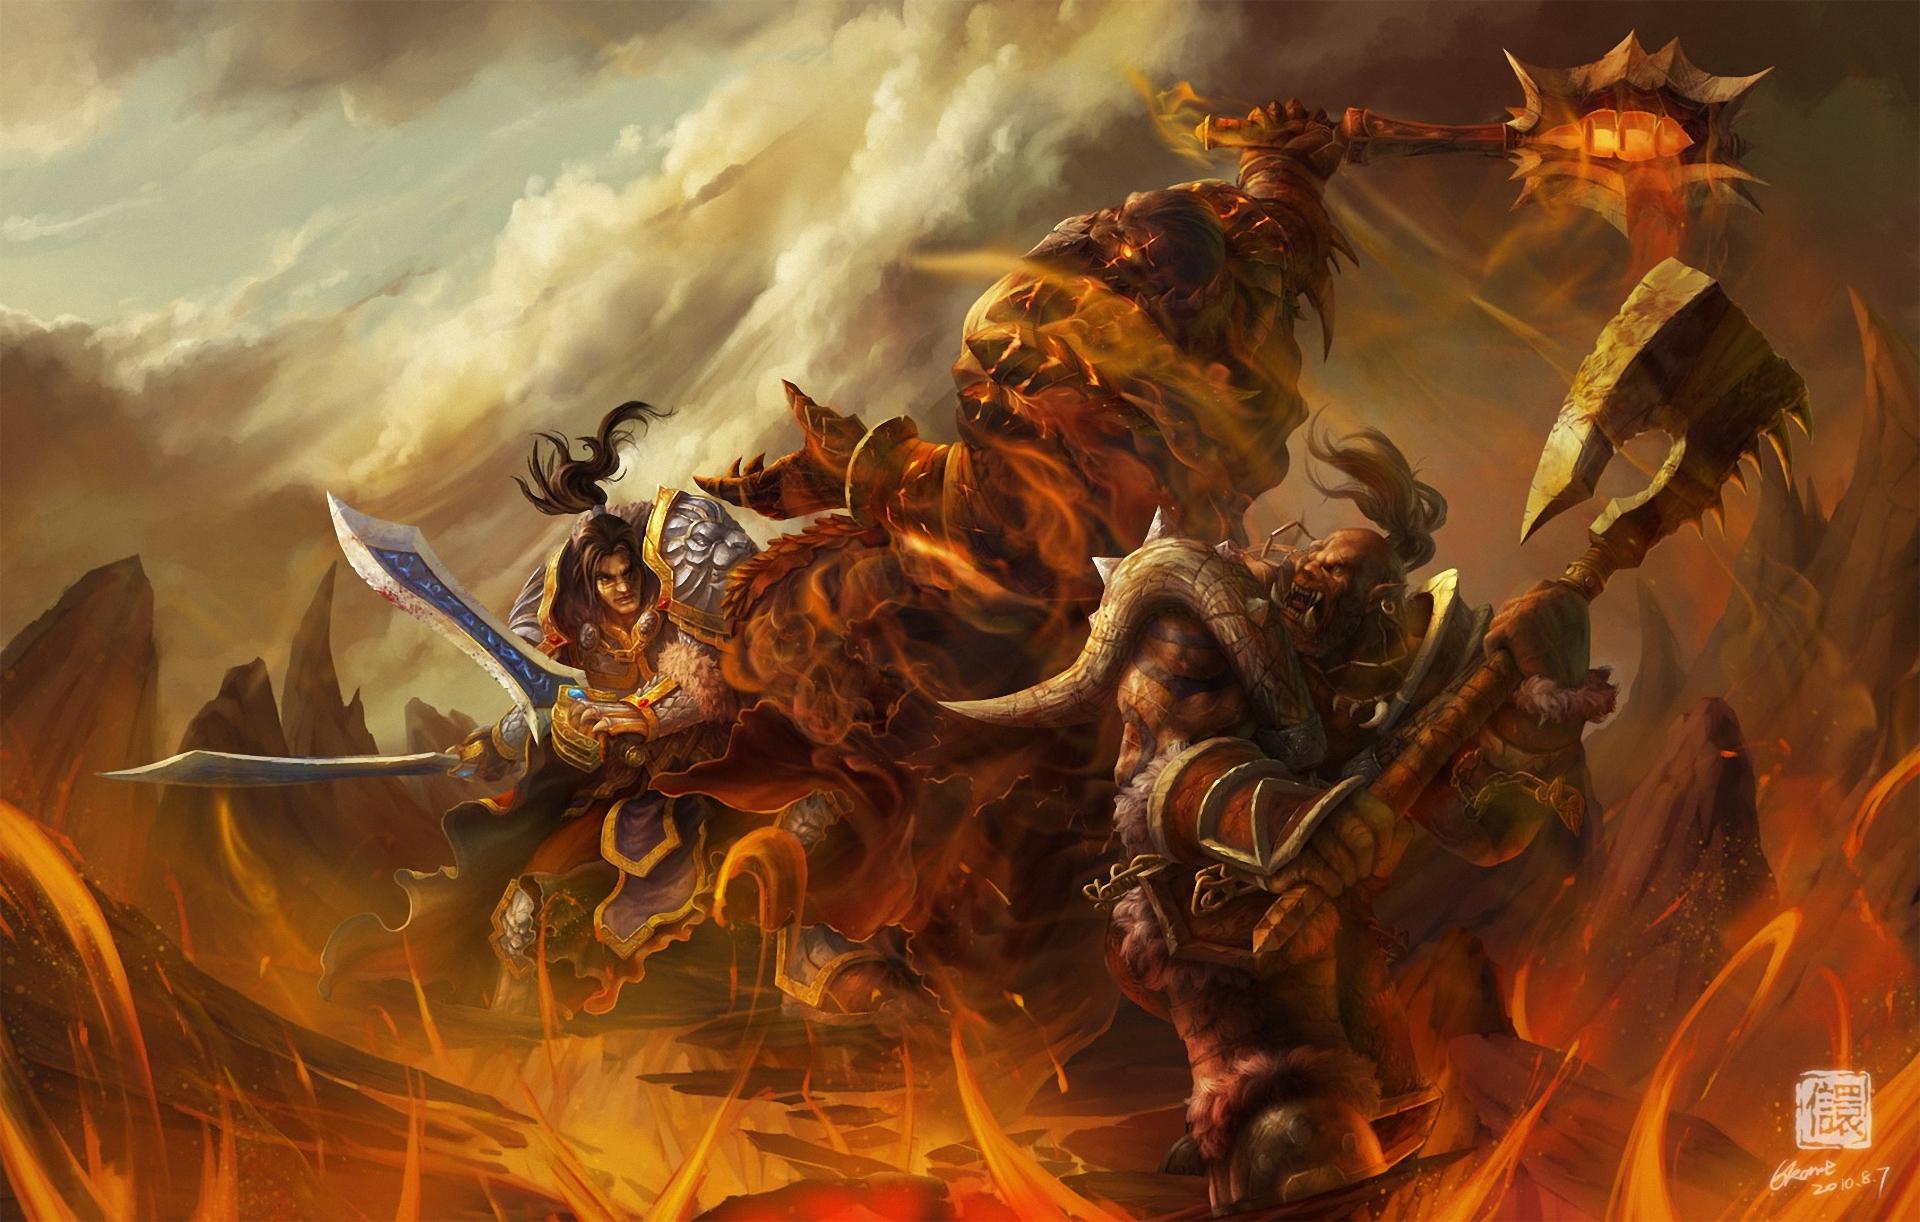 World Of Warcraft Wow Warrior Orc Battle Monster Axe Games